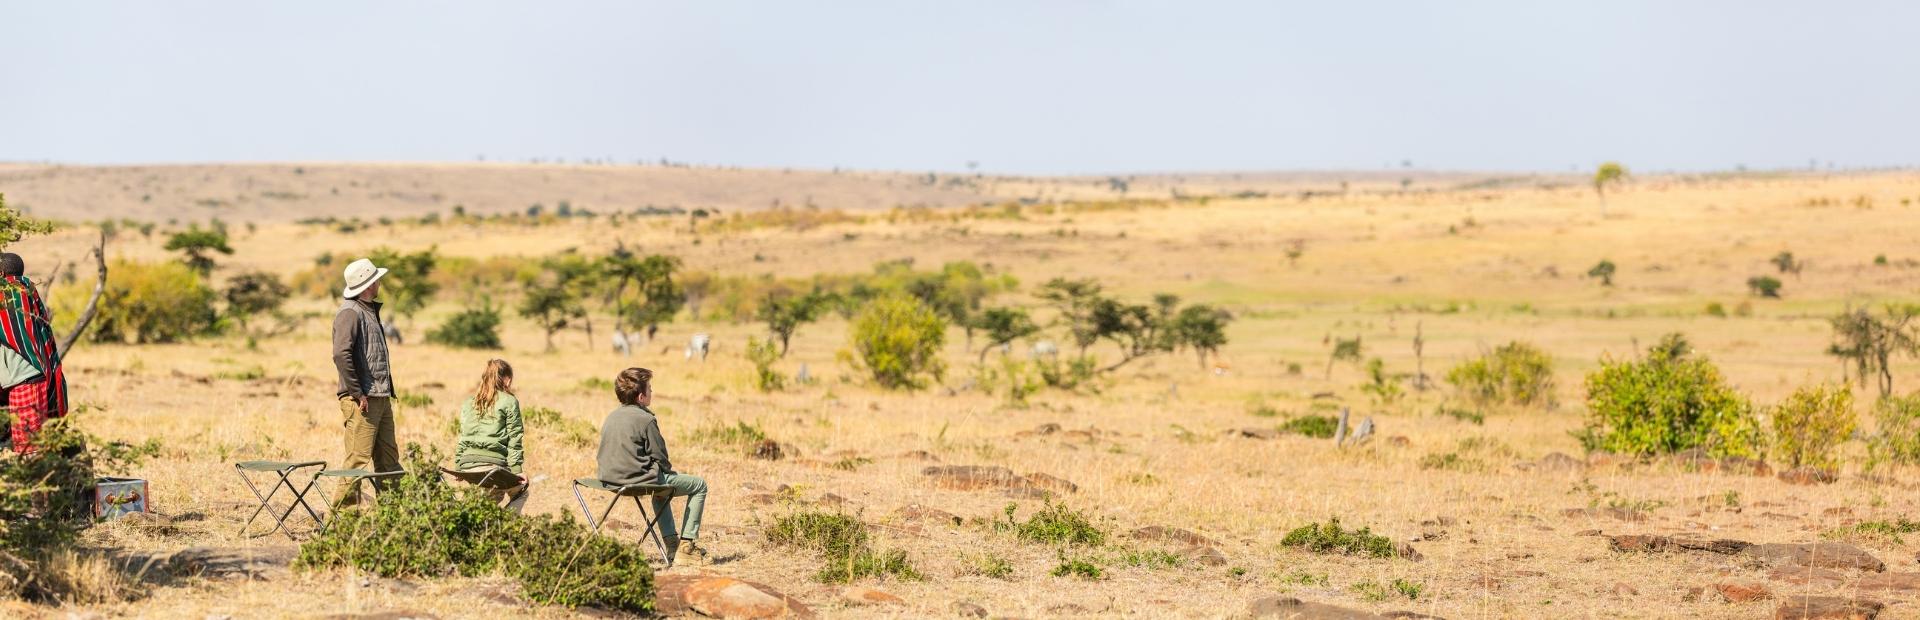 Safari Afrika met kinderen